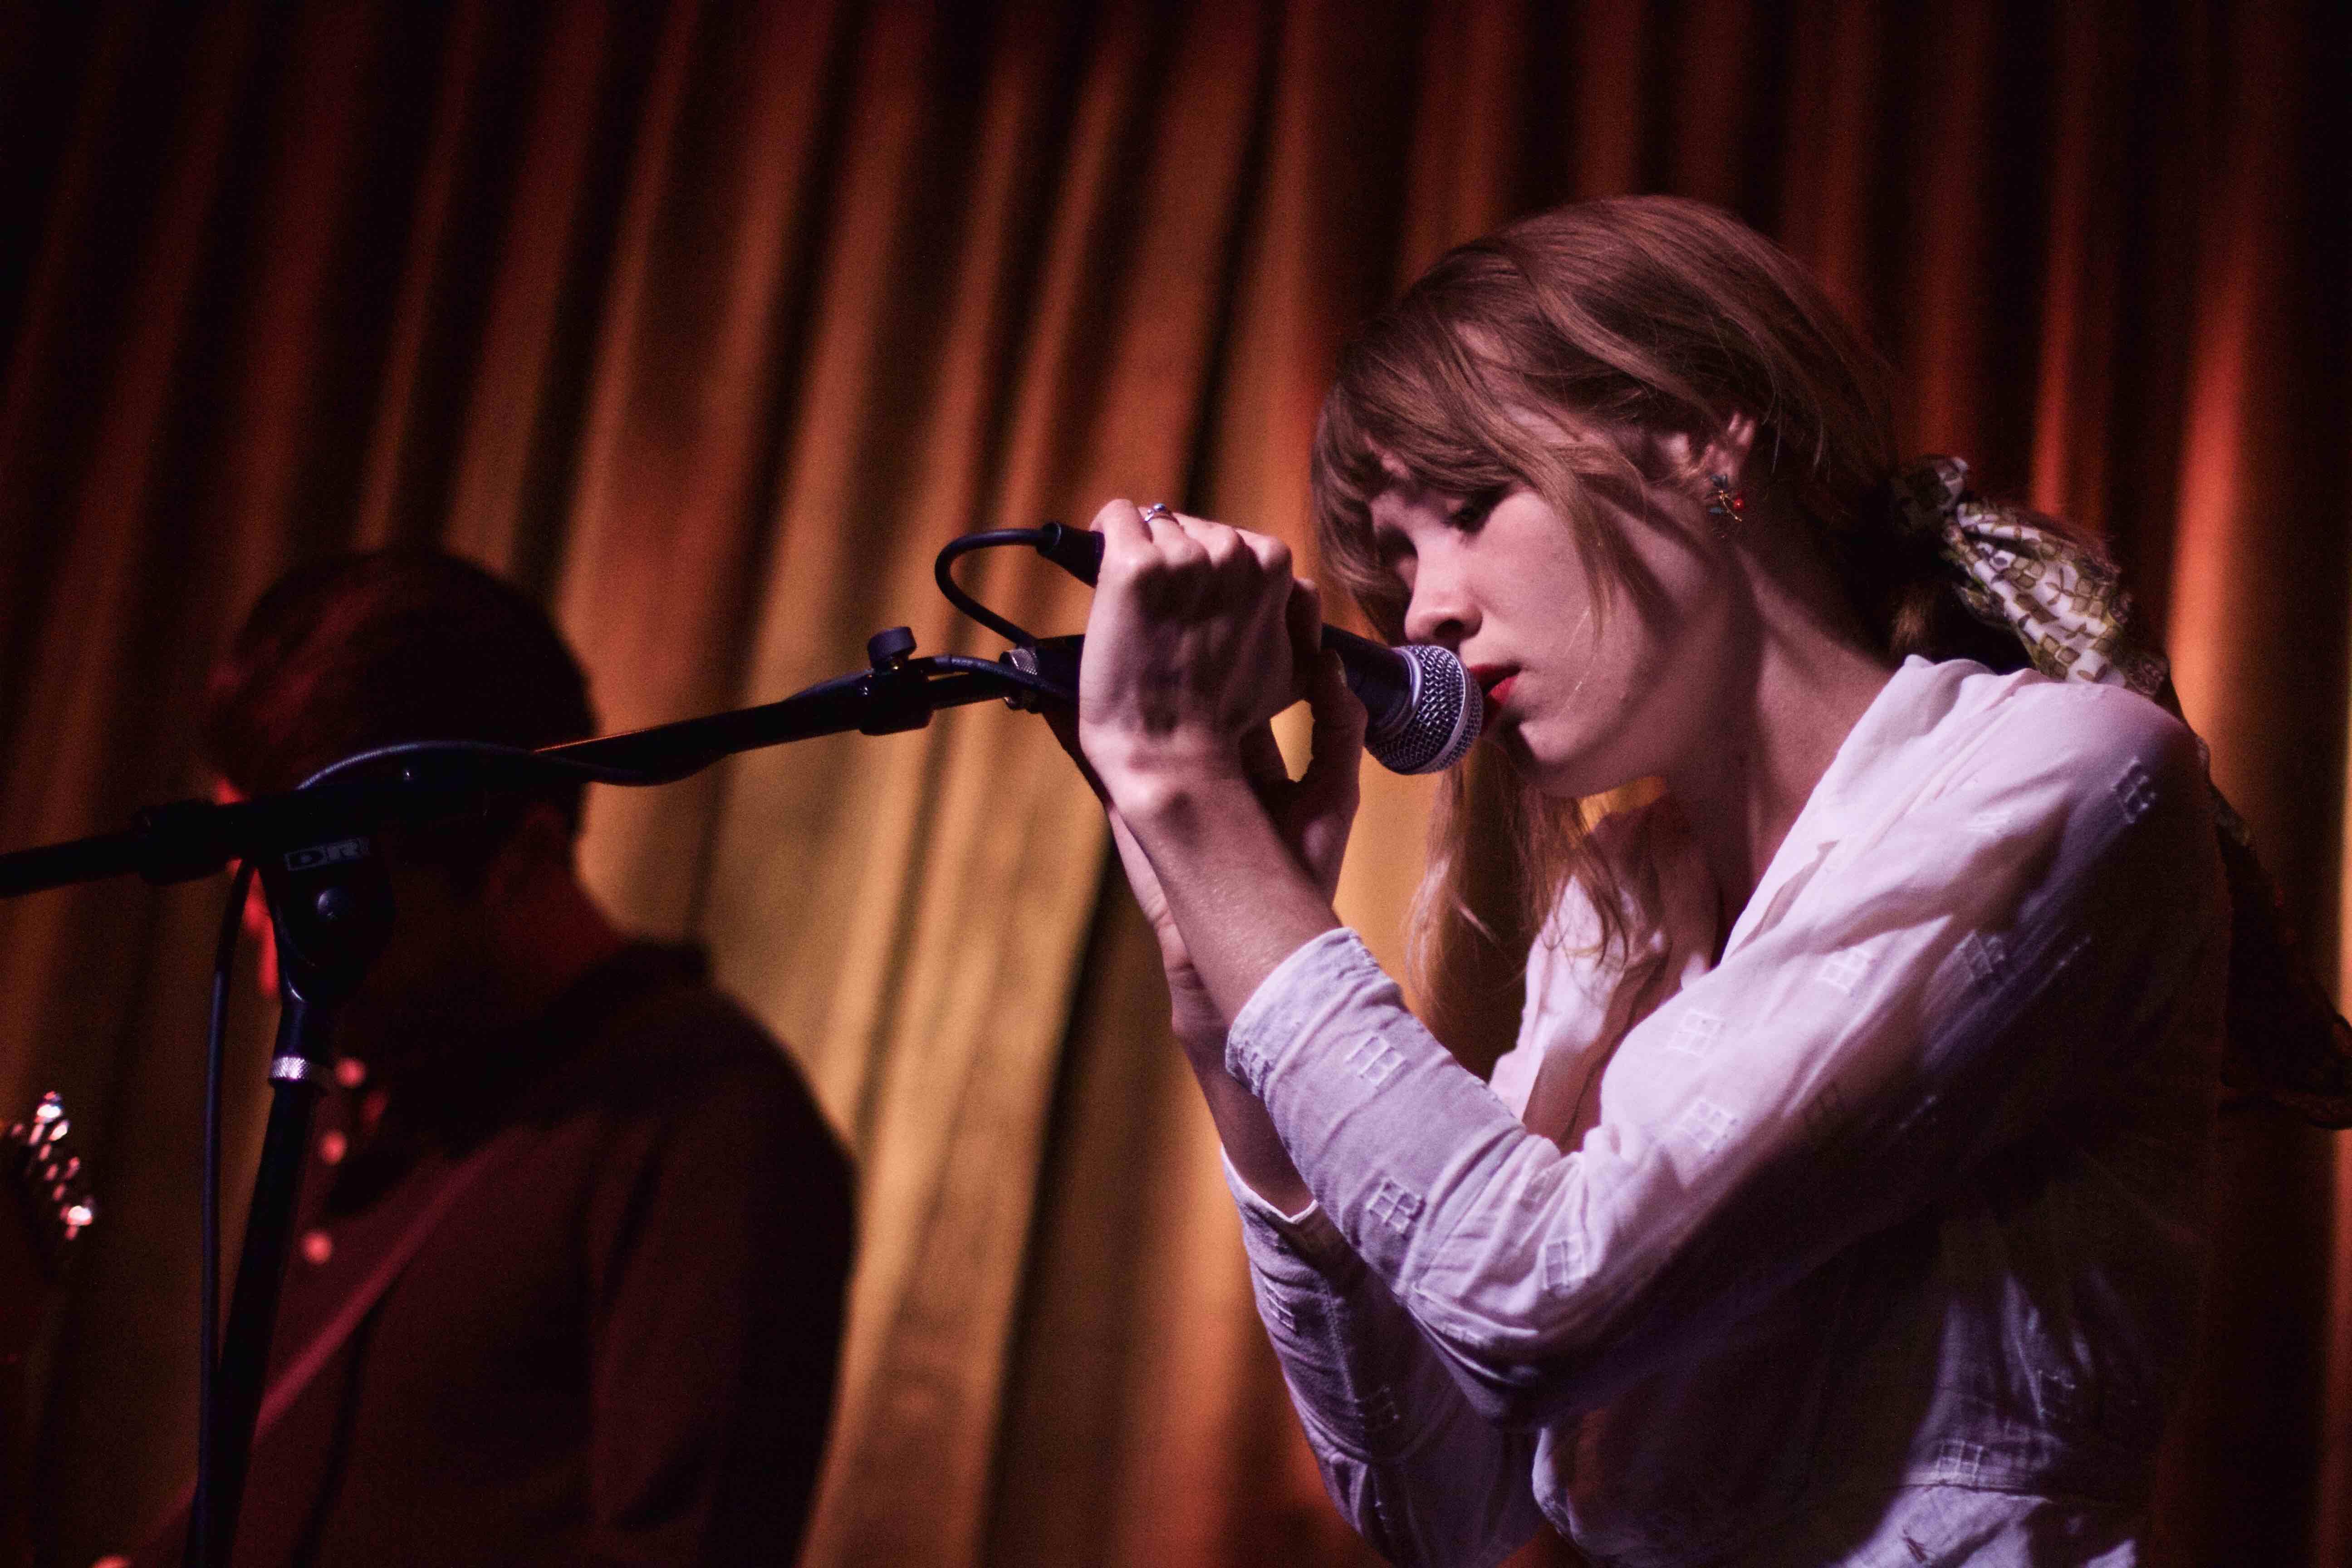 Alexandra Savior @ Hotel Cafe 5/12/16 | Concert Photo By Derrick K Lee